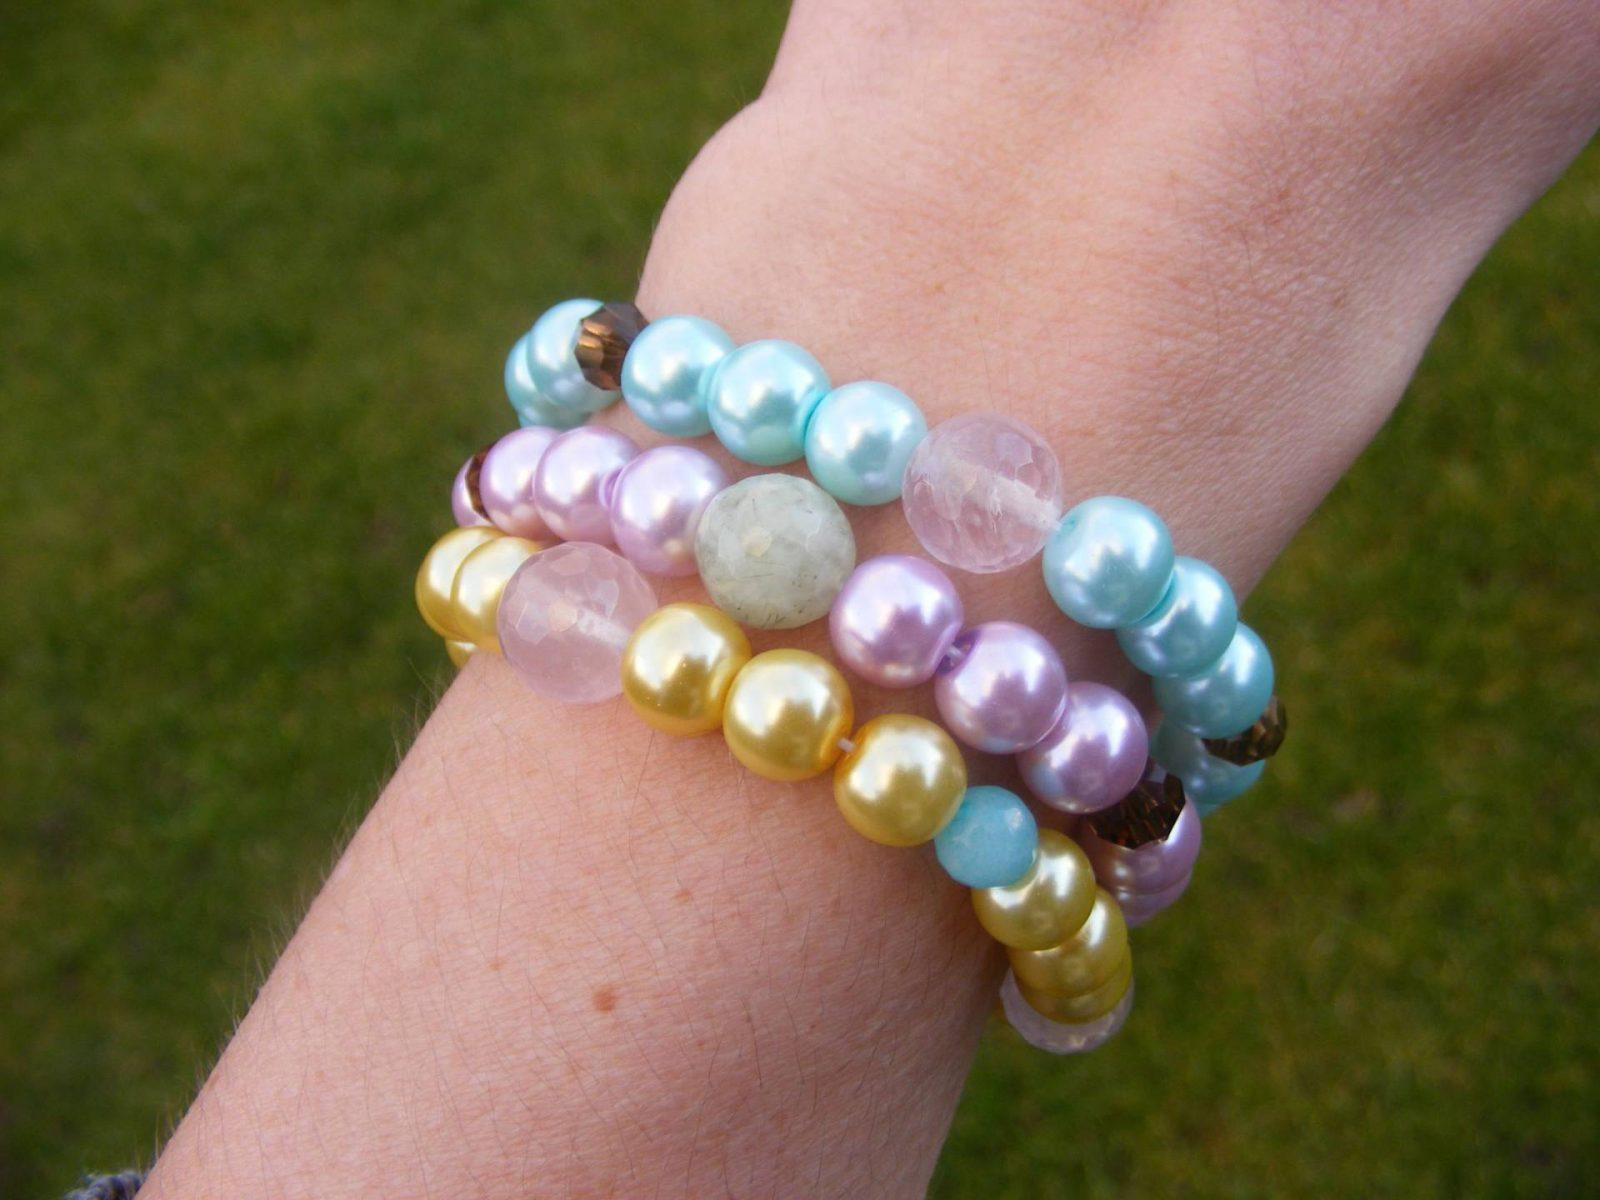 Handmade Jewellery for Spring, Pearl bracelets